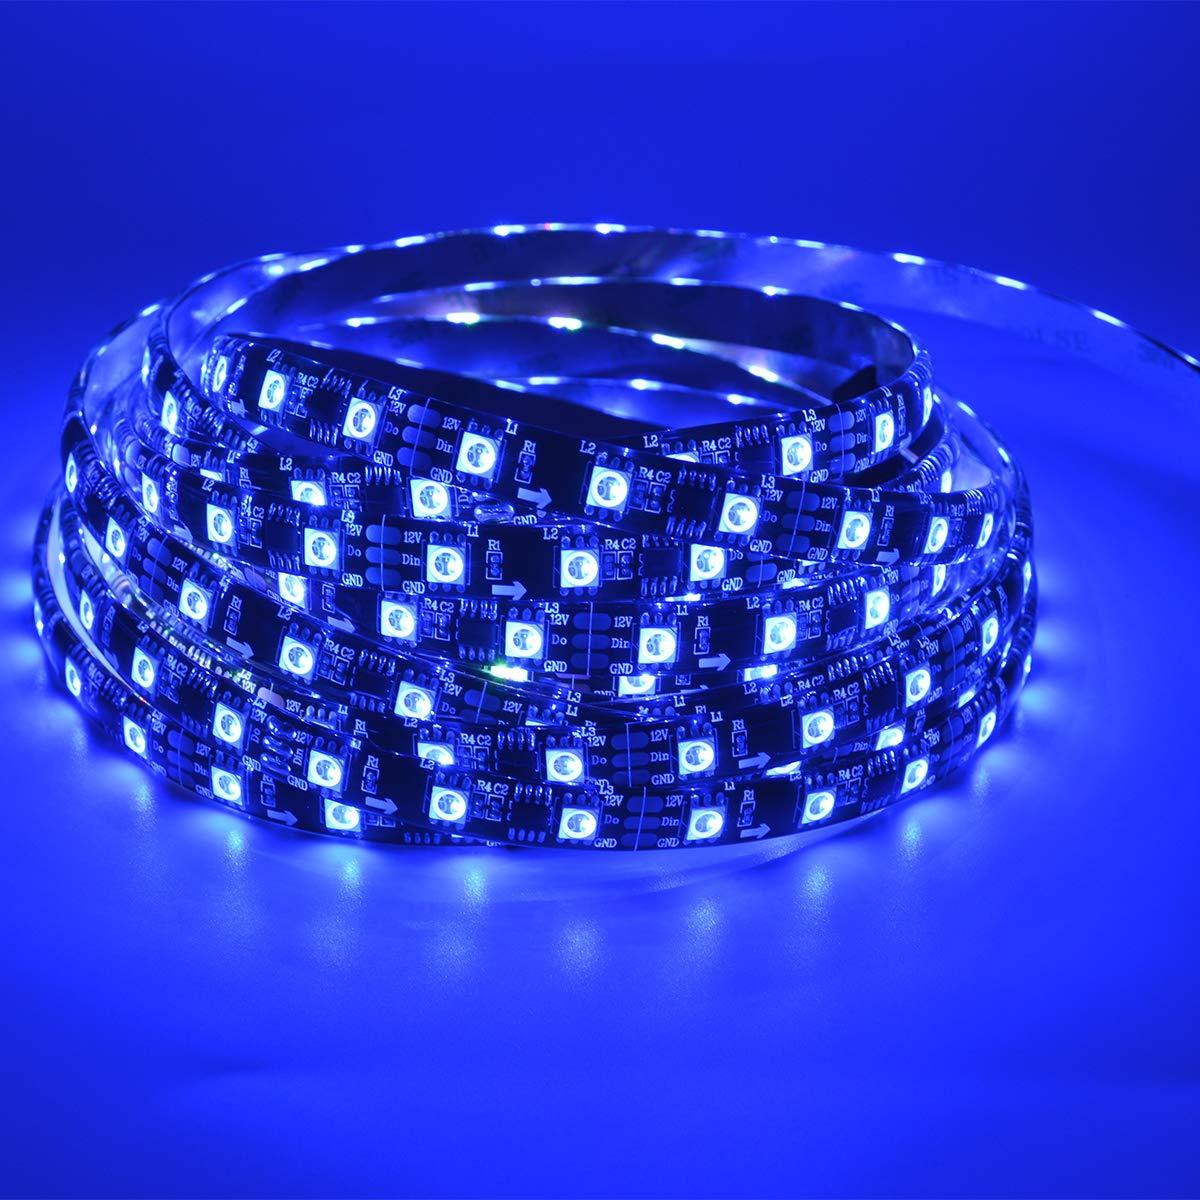 WS2811 DC12V 300LEDs Programmable LED Strip Lights, Addressable